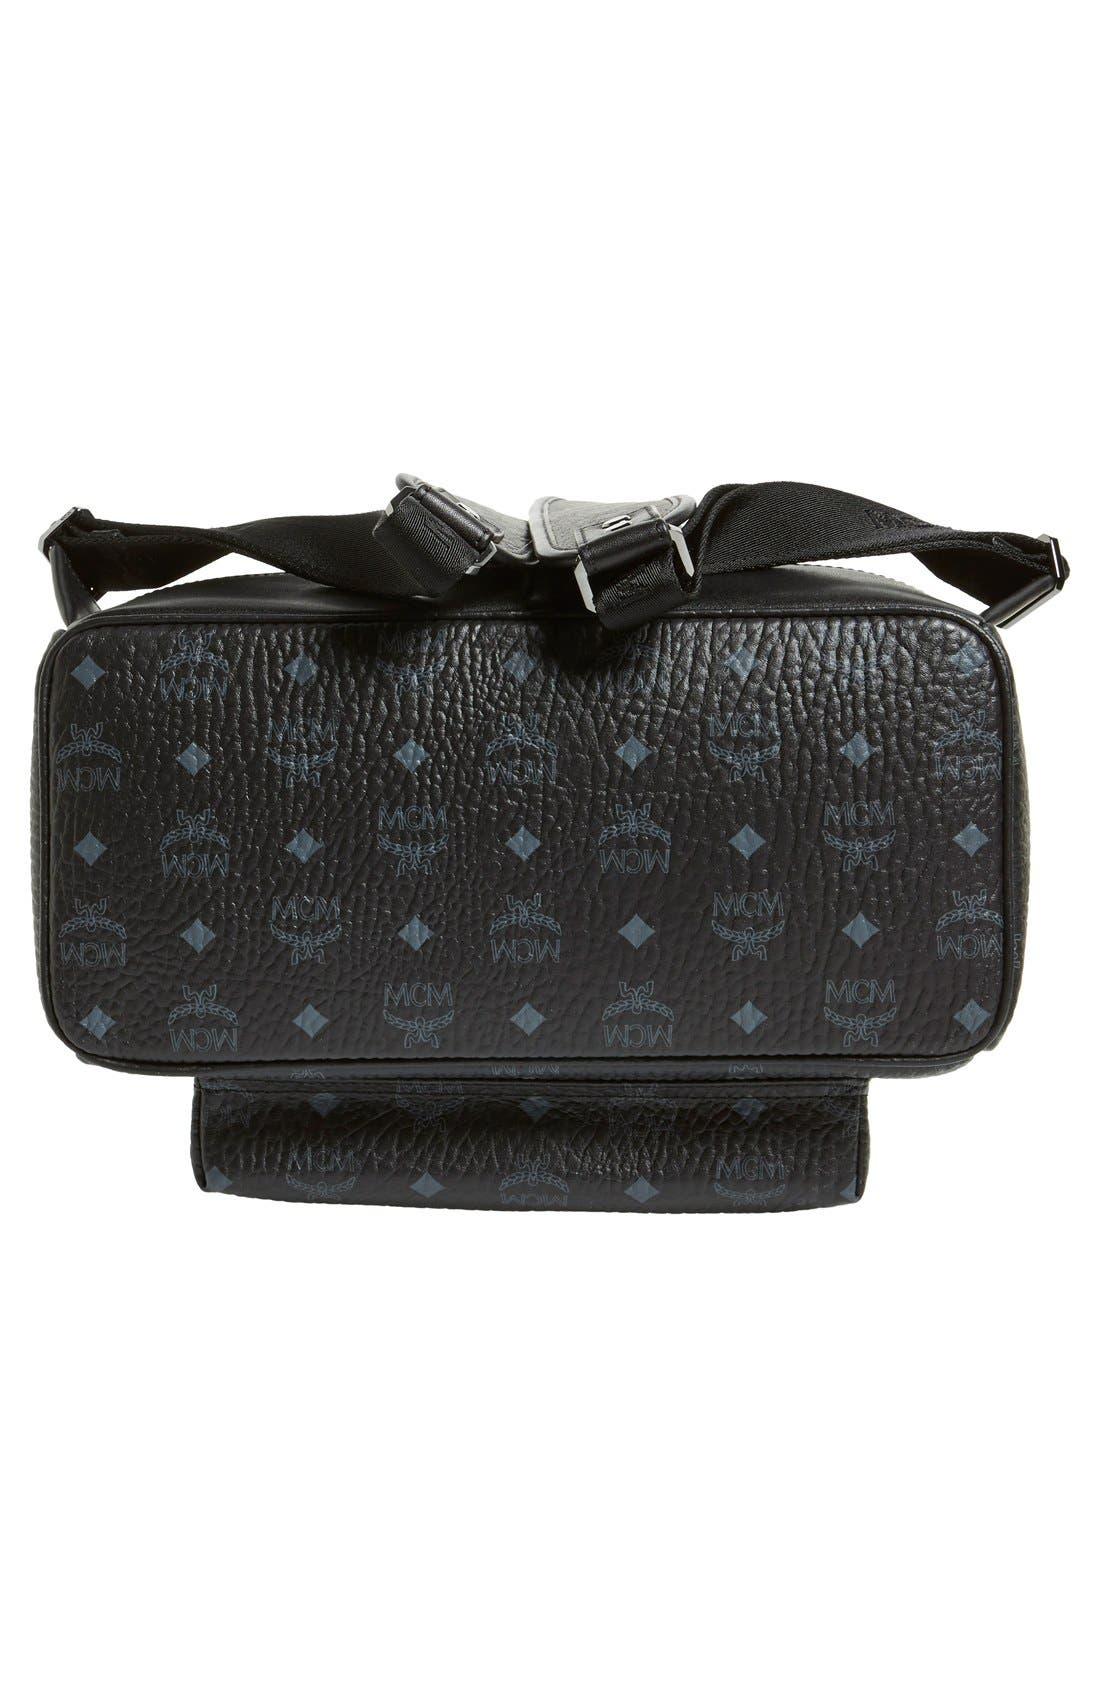 Medium Stark - Visetos Backpack,                             Alternate thumbnail 6, color,                             BLACK